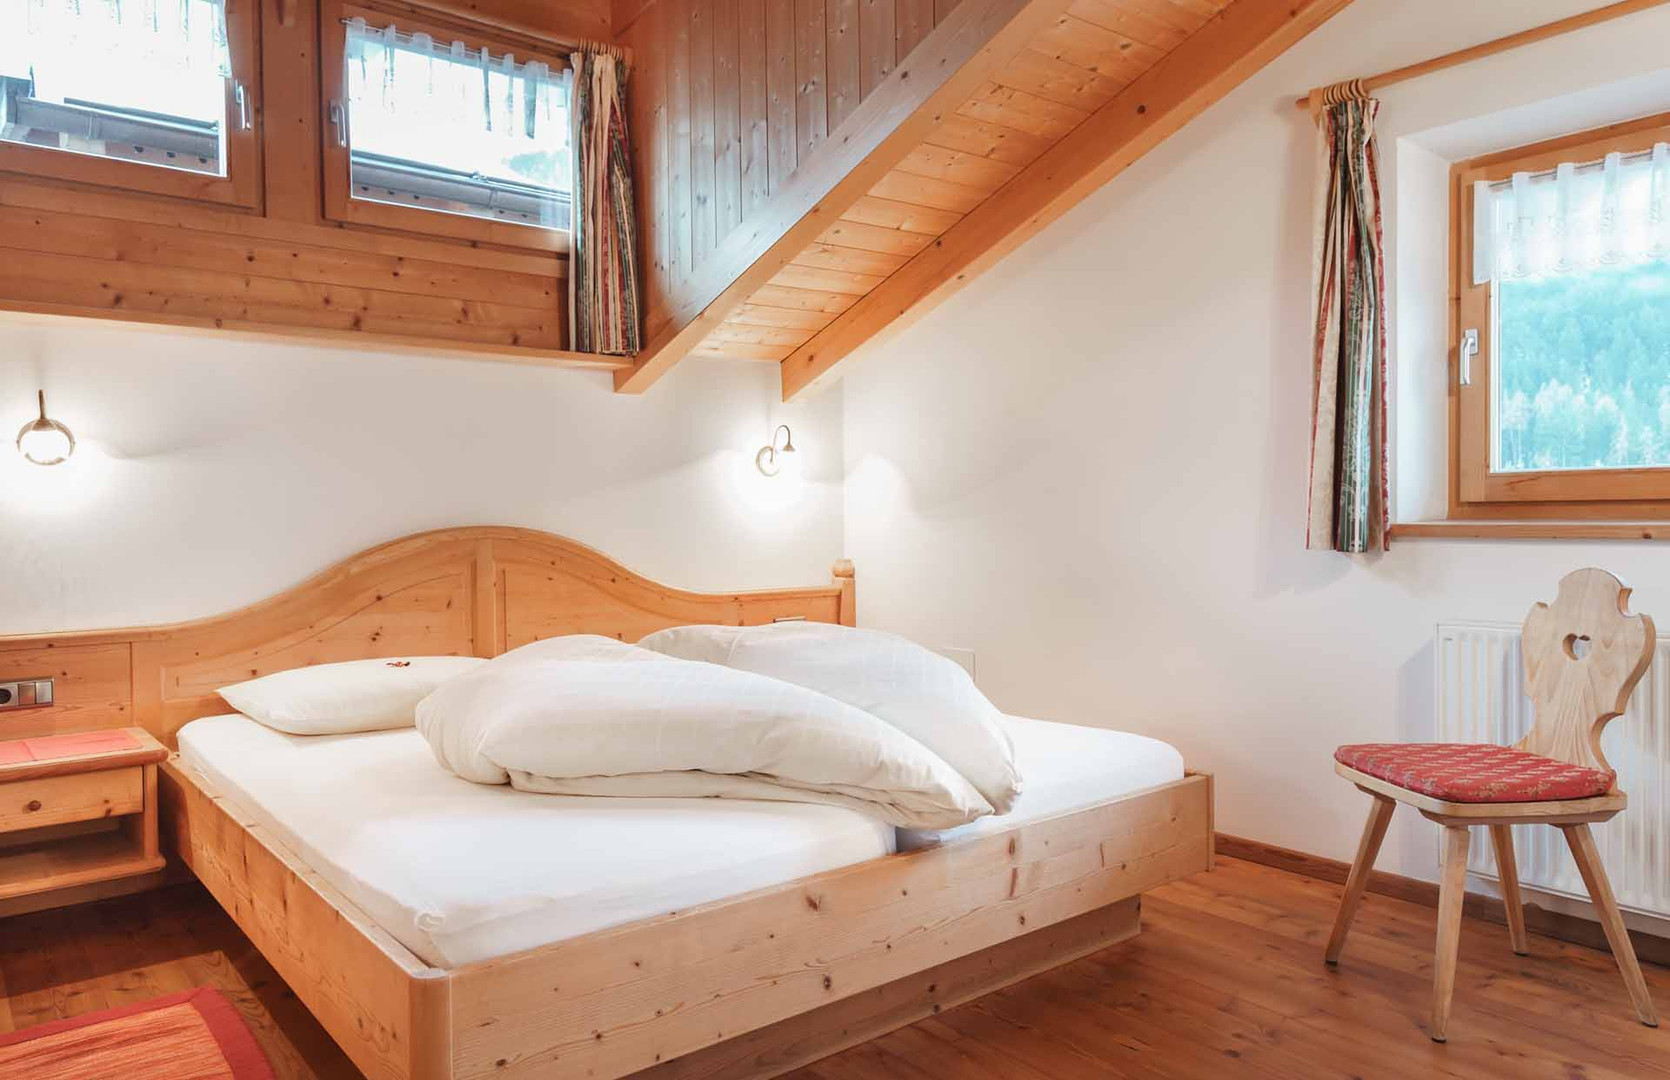 Residence_Karnutsch_Ultental_Margerite2.